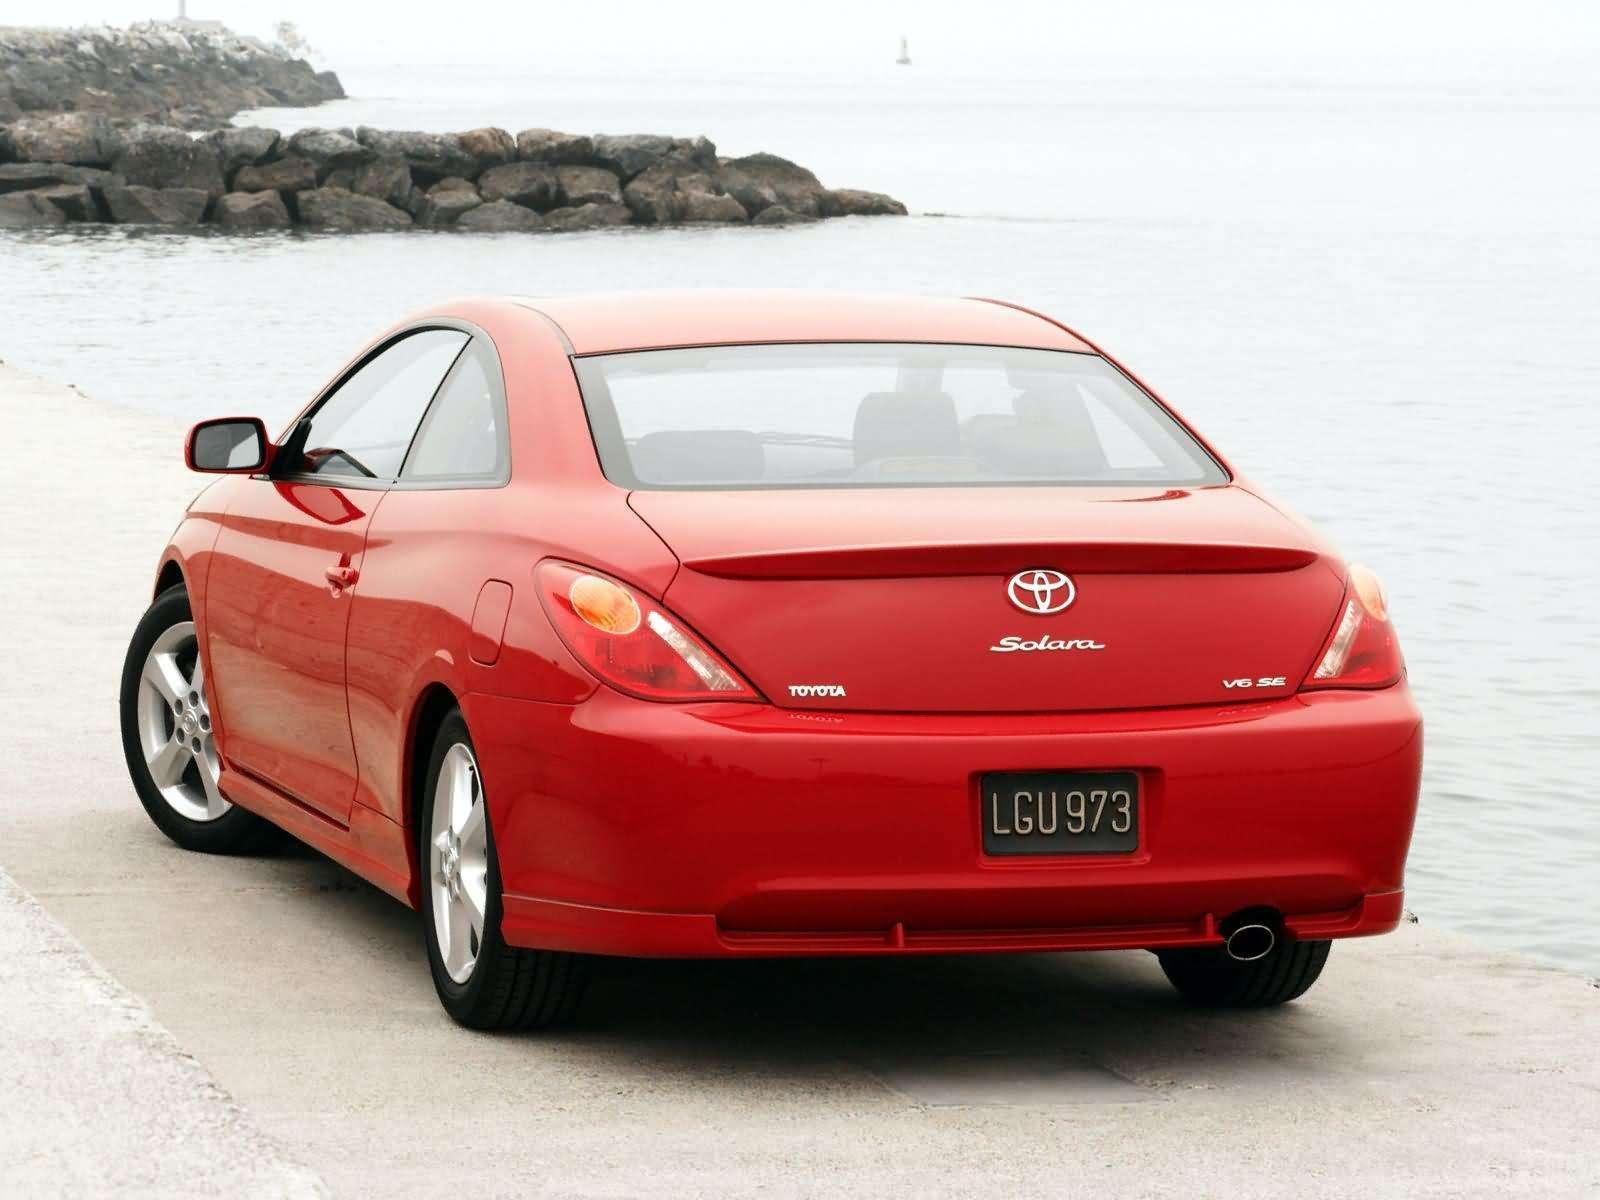 Toyota Camry Solara Coupe 1999